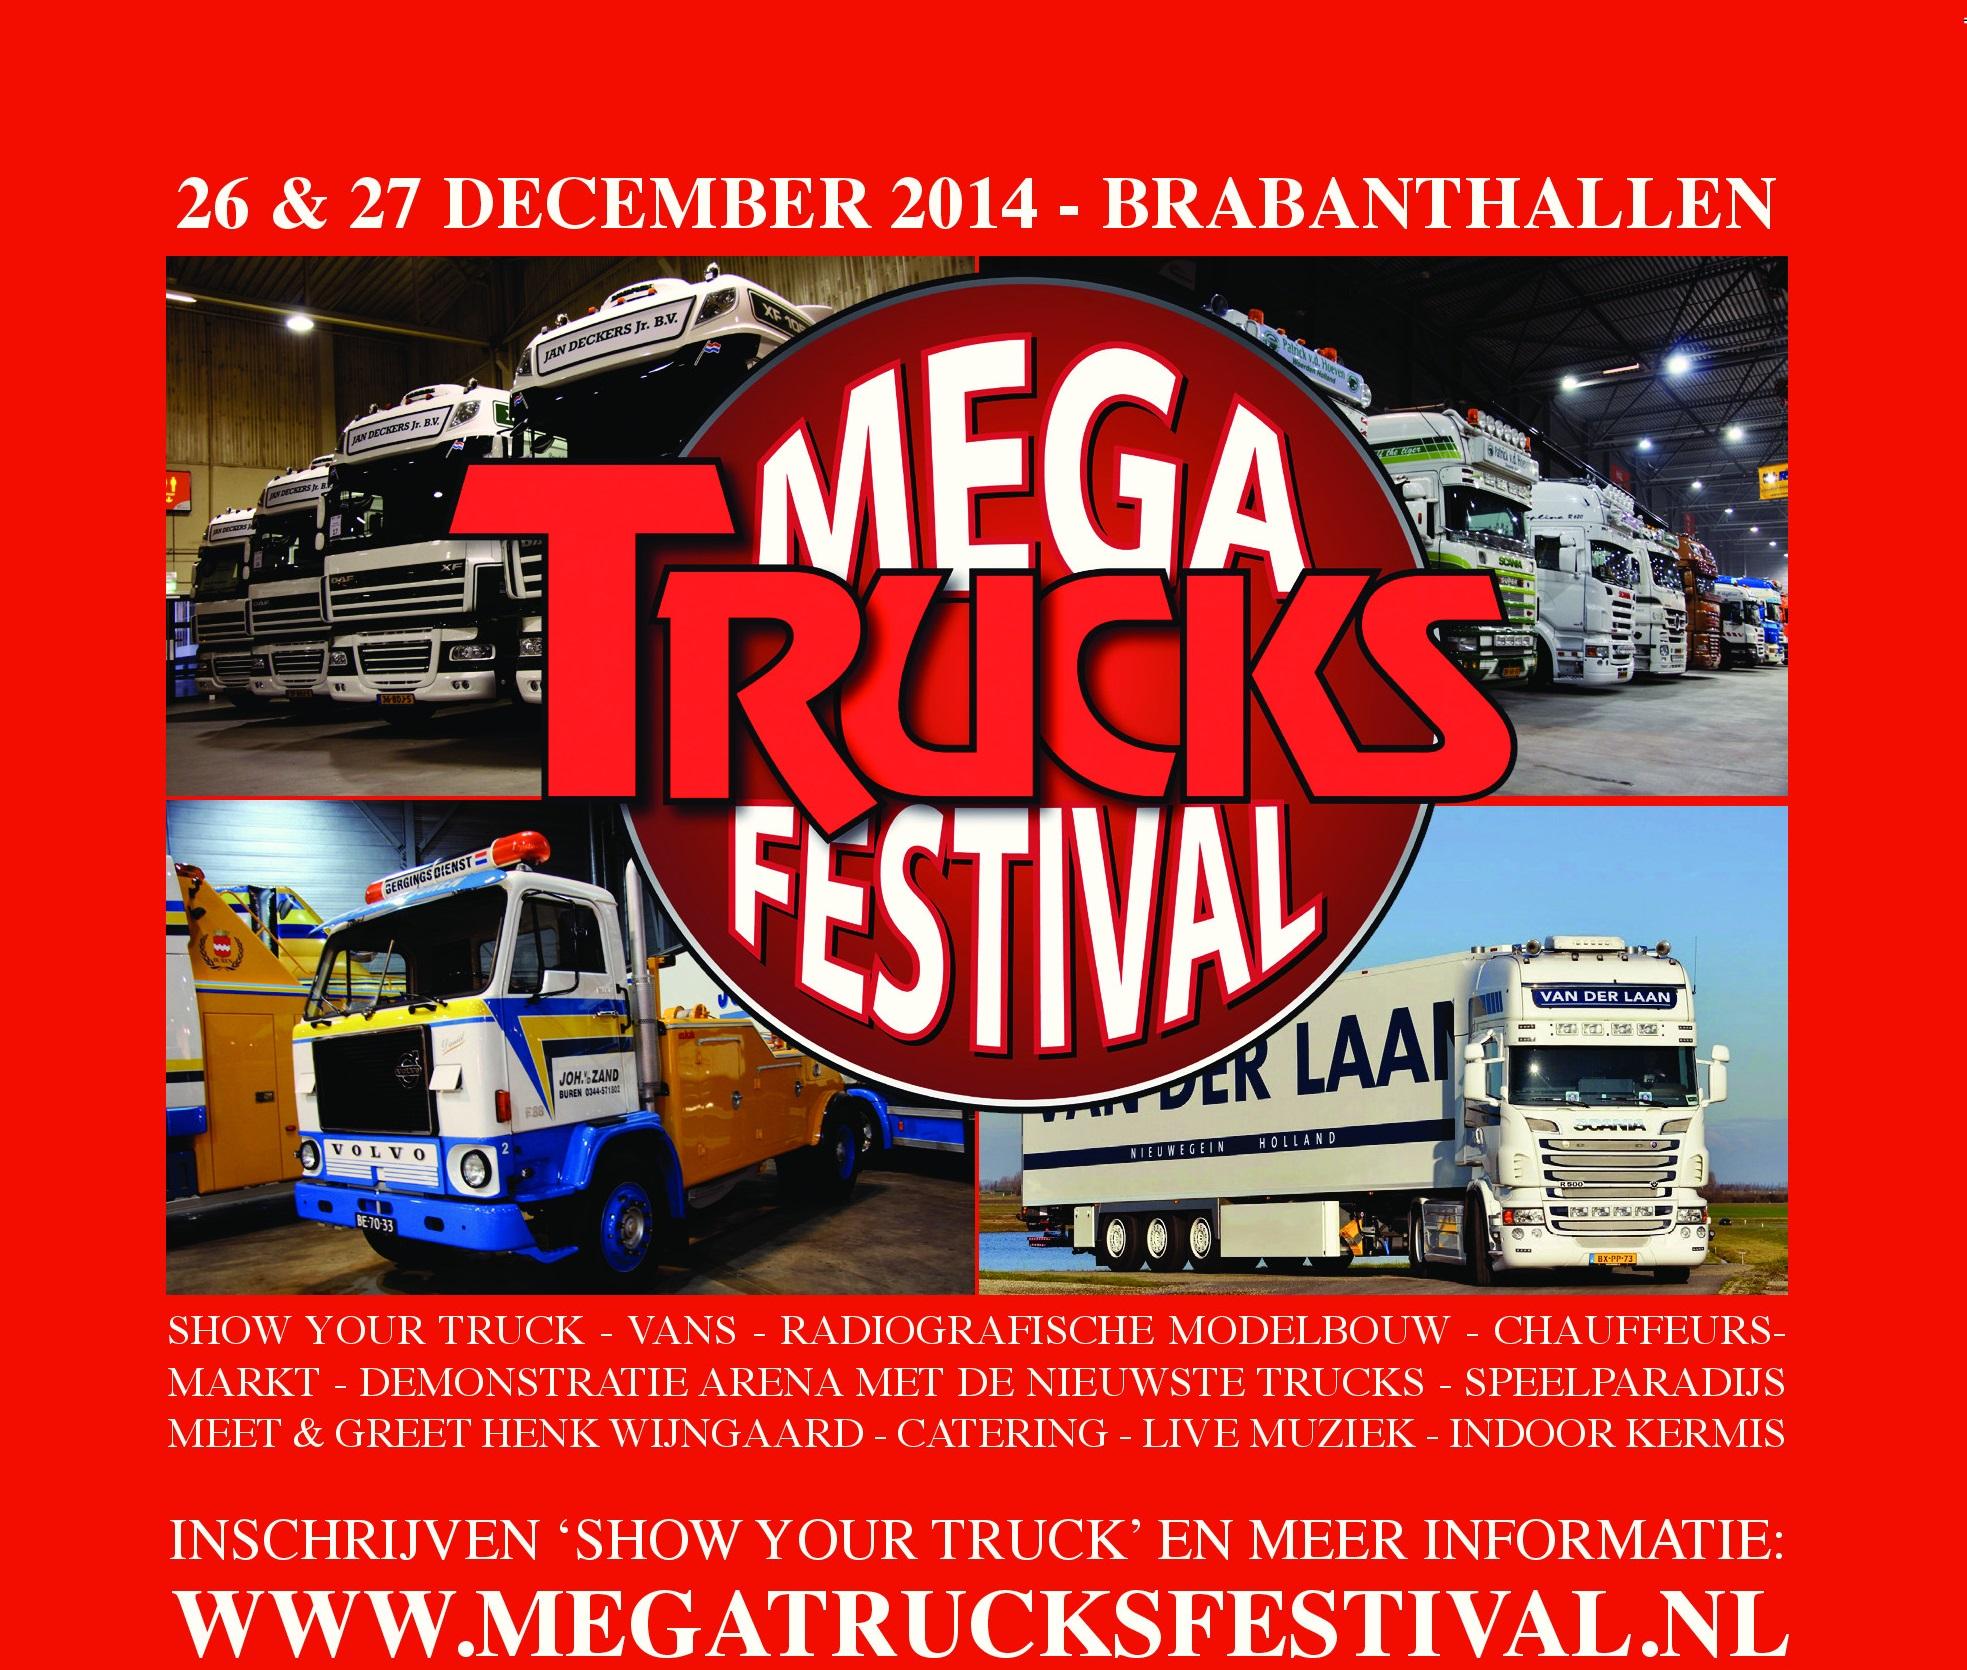 MegaTrucksFestival